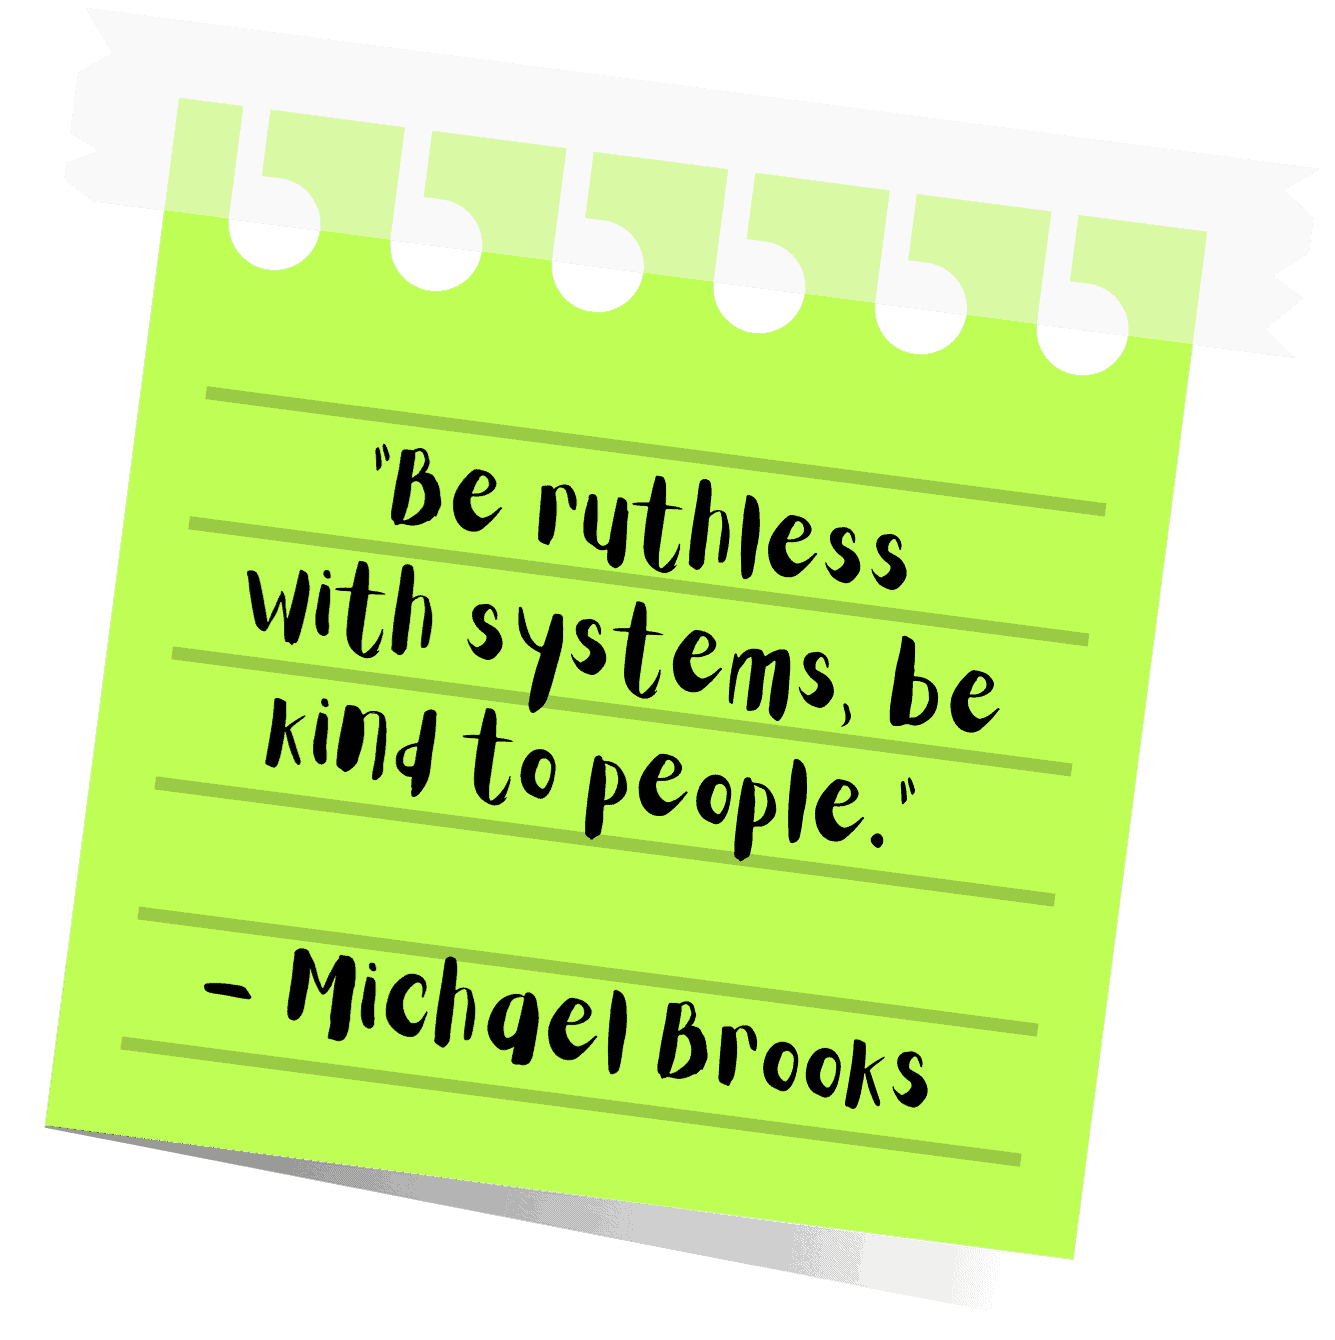 michael brooks quote